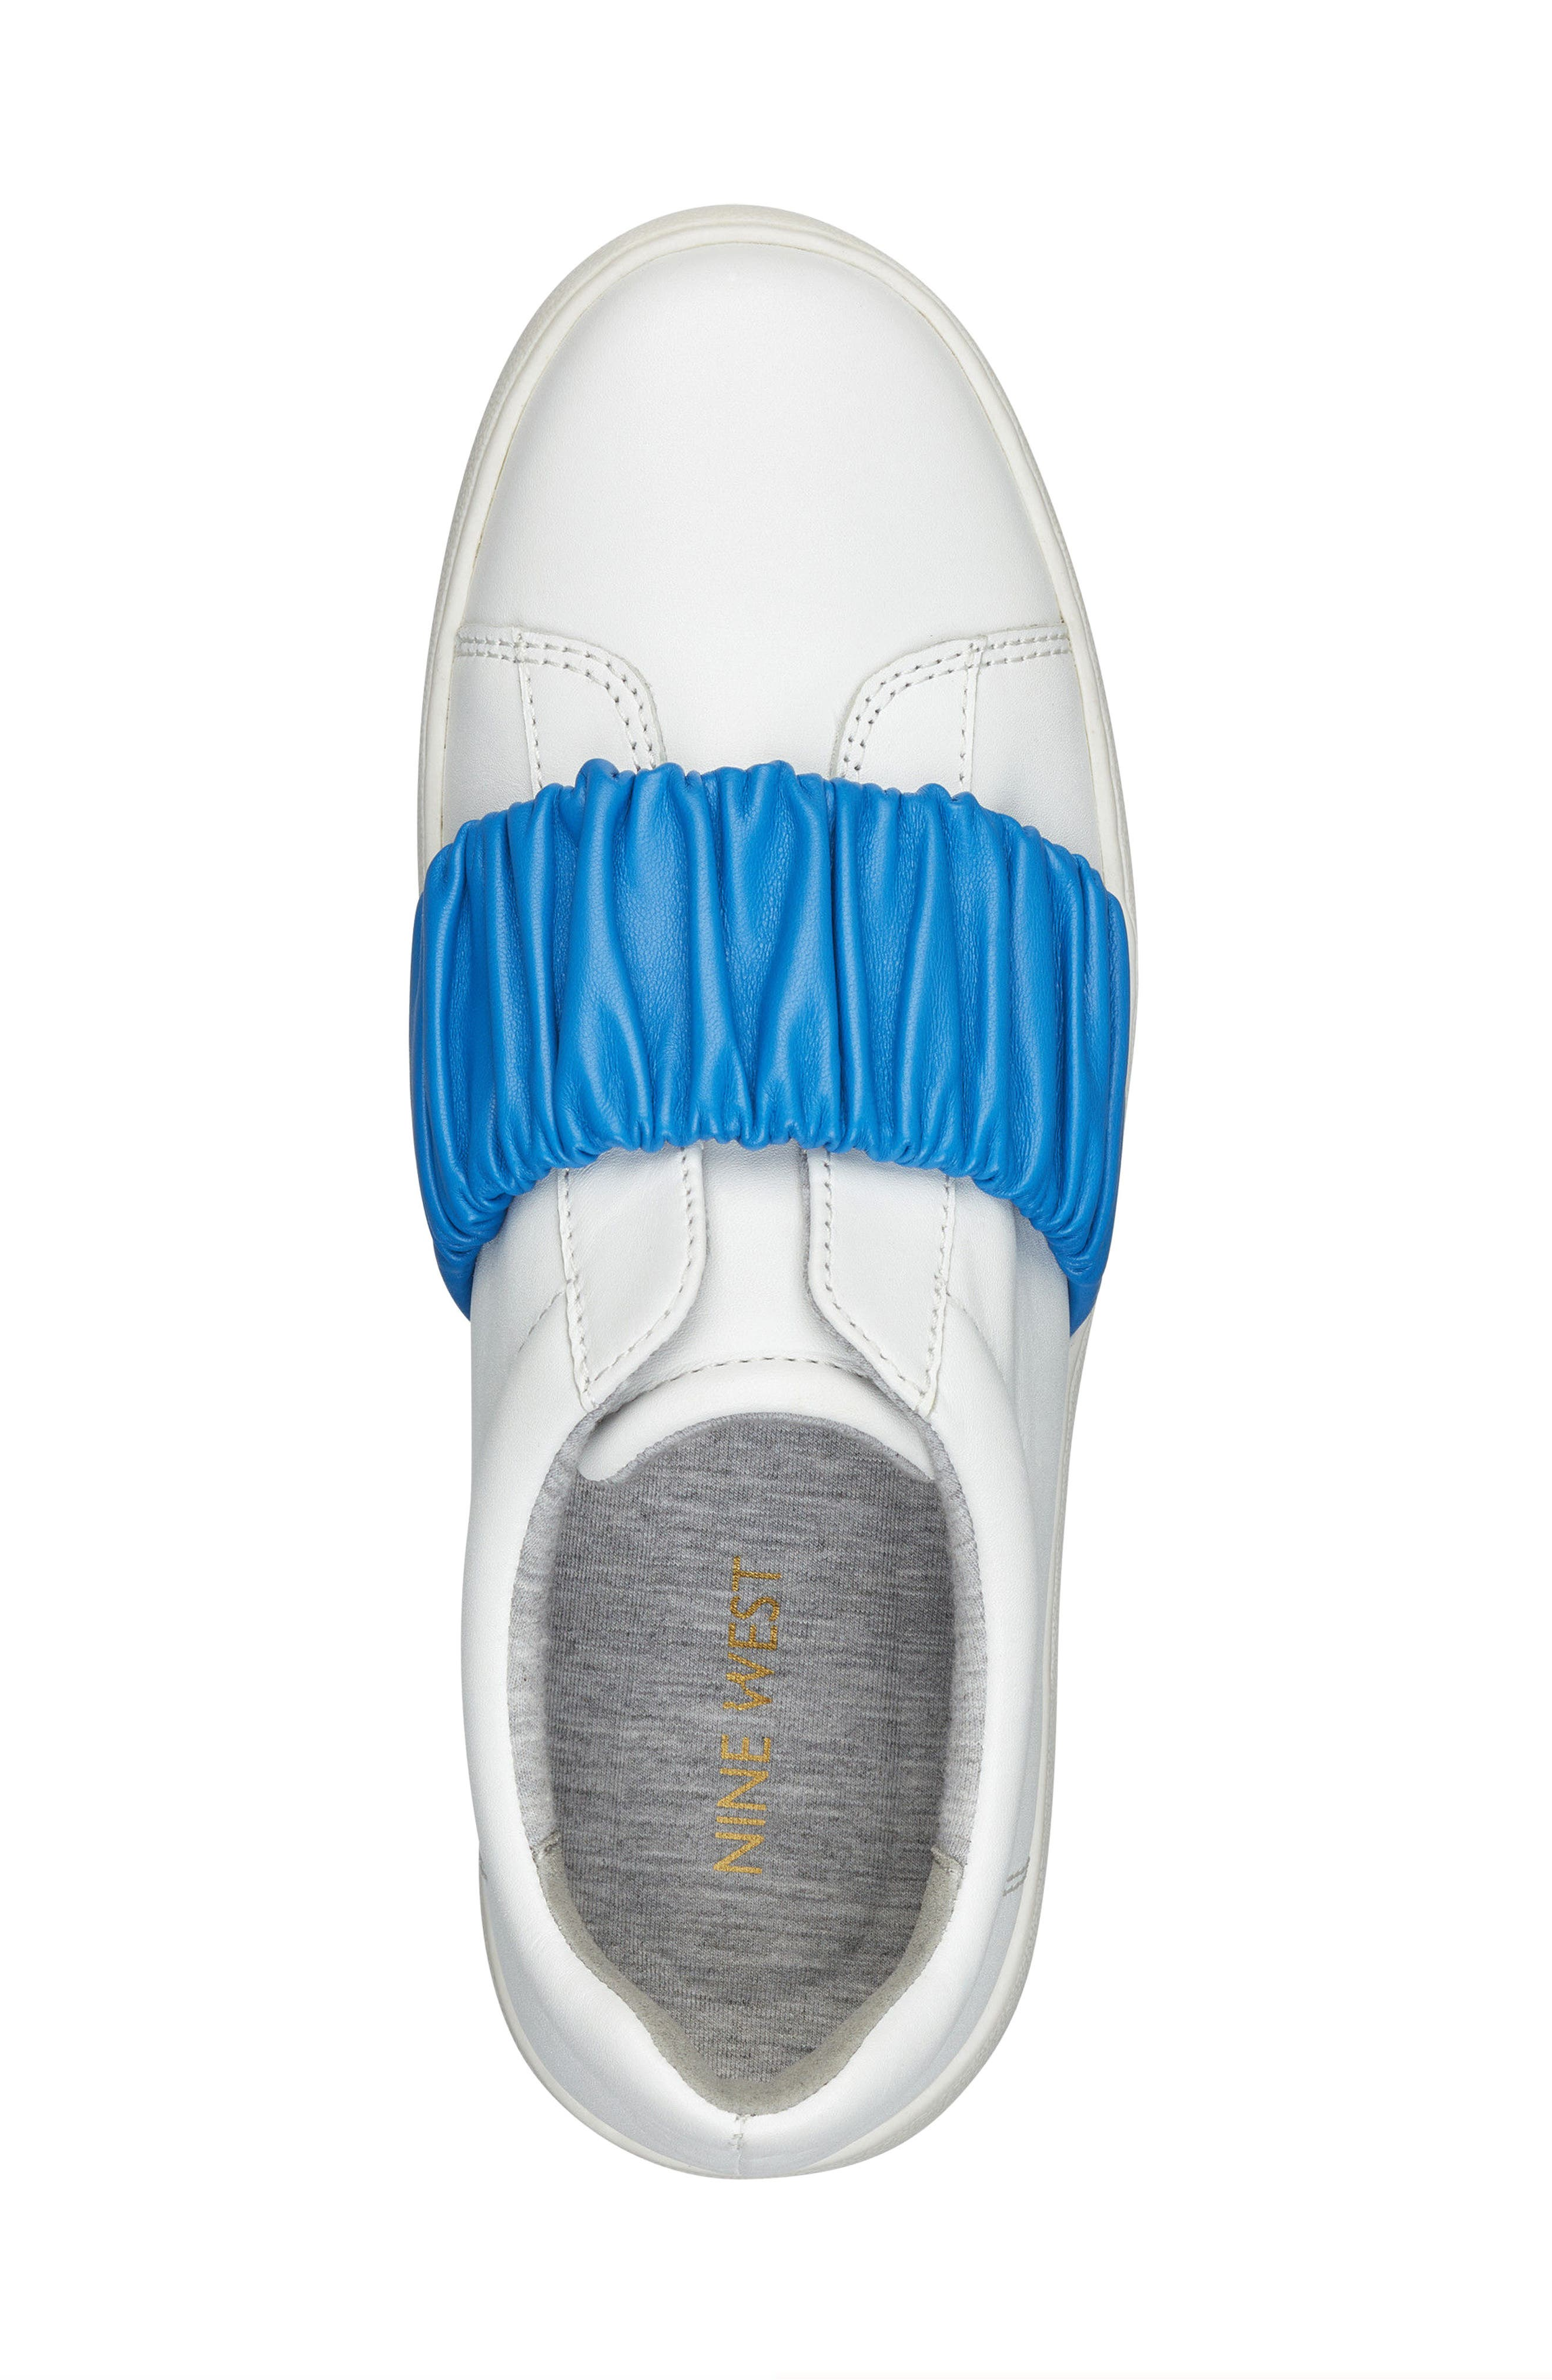 Pindiviah Slip-On Sneaker,                             Alternate thumbnail 5, color,                             100